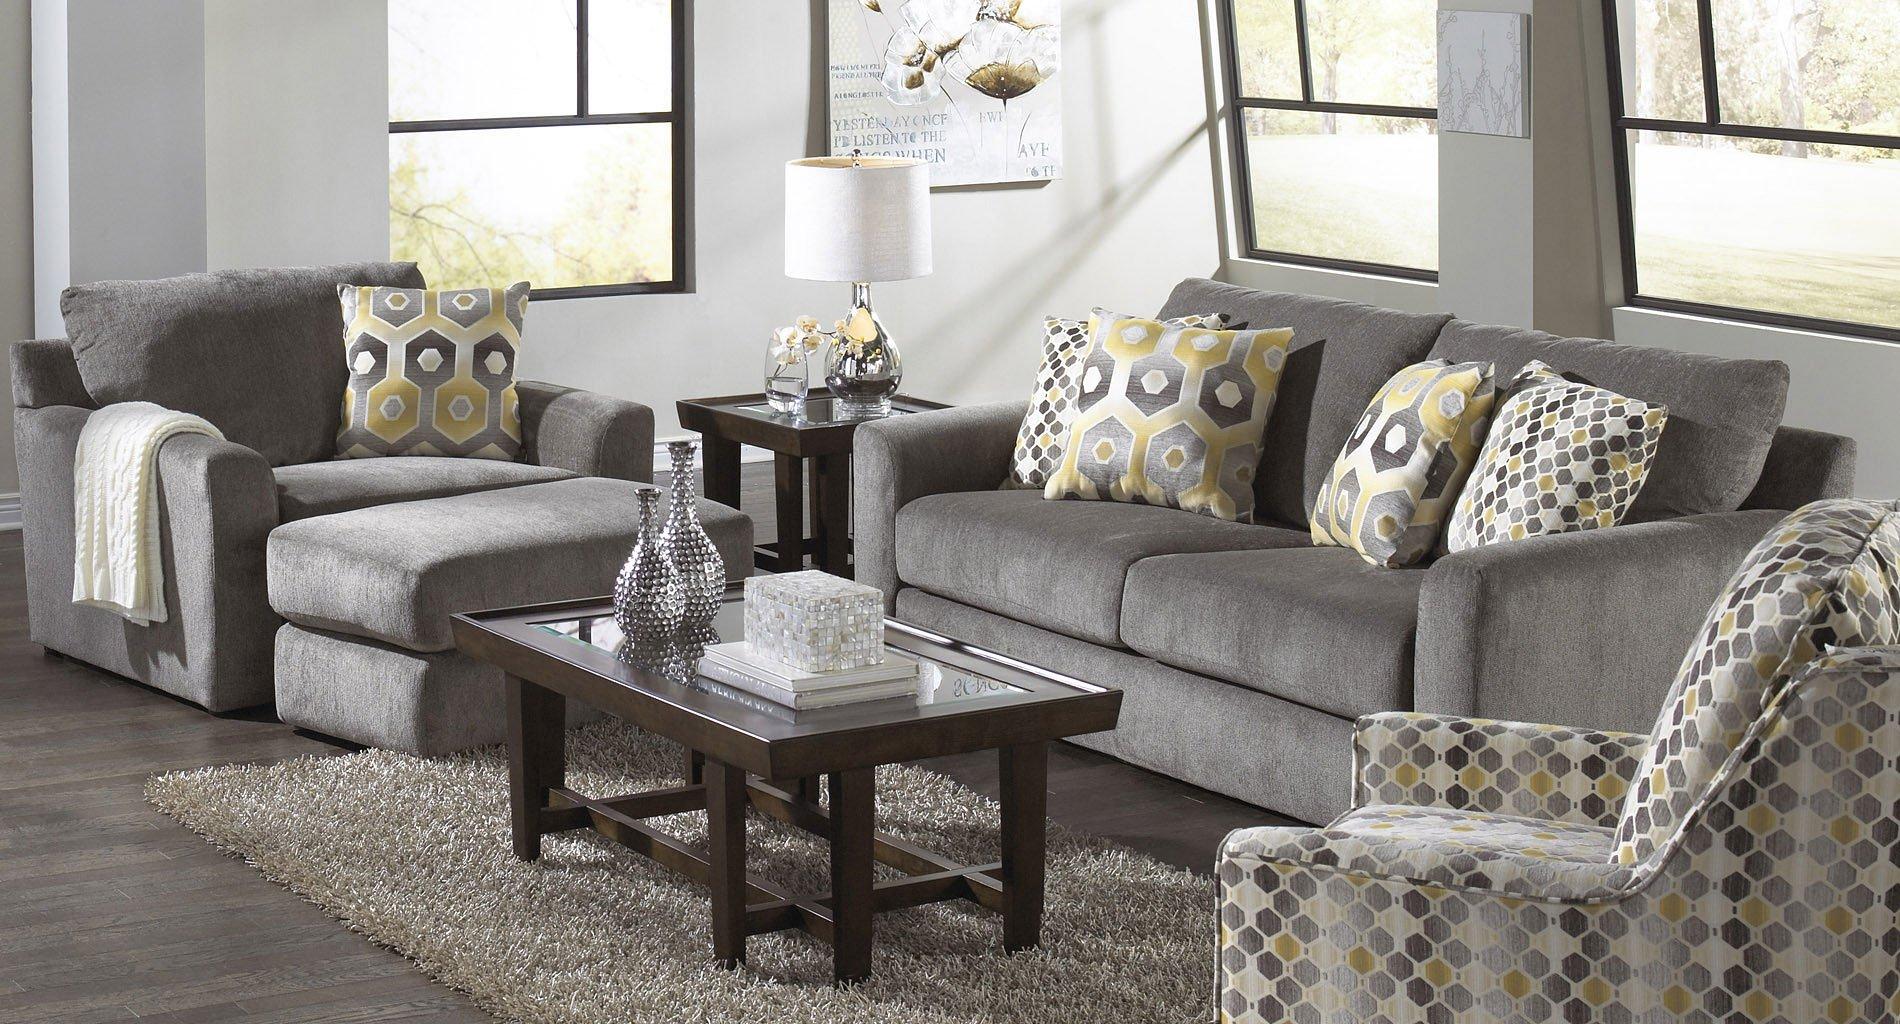 Sutton Living Room Set (Cobblestone) Jackson Furniture, 1 Reviews |  Furniture Cart